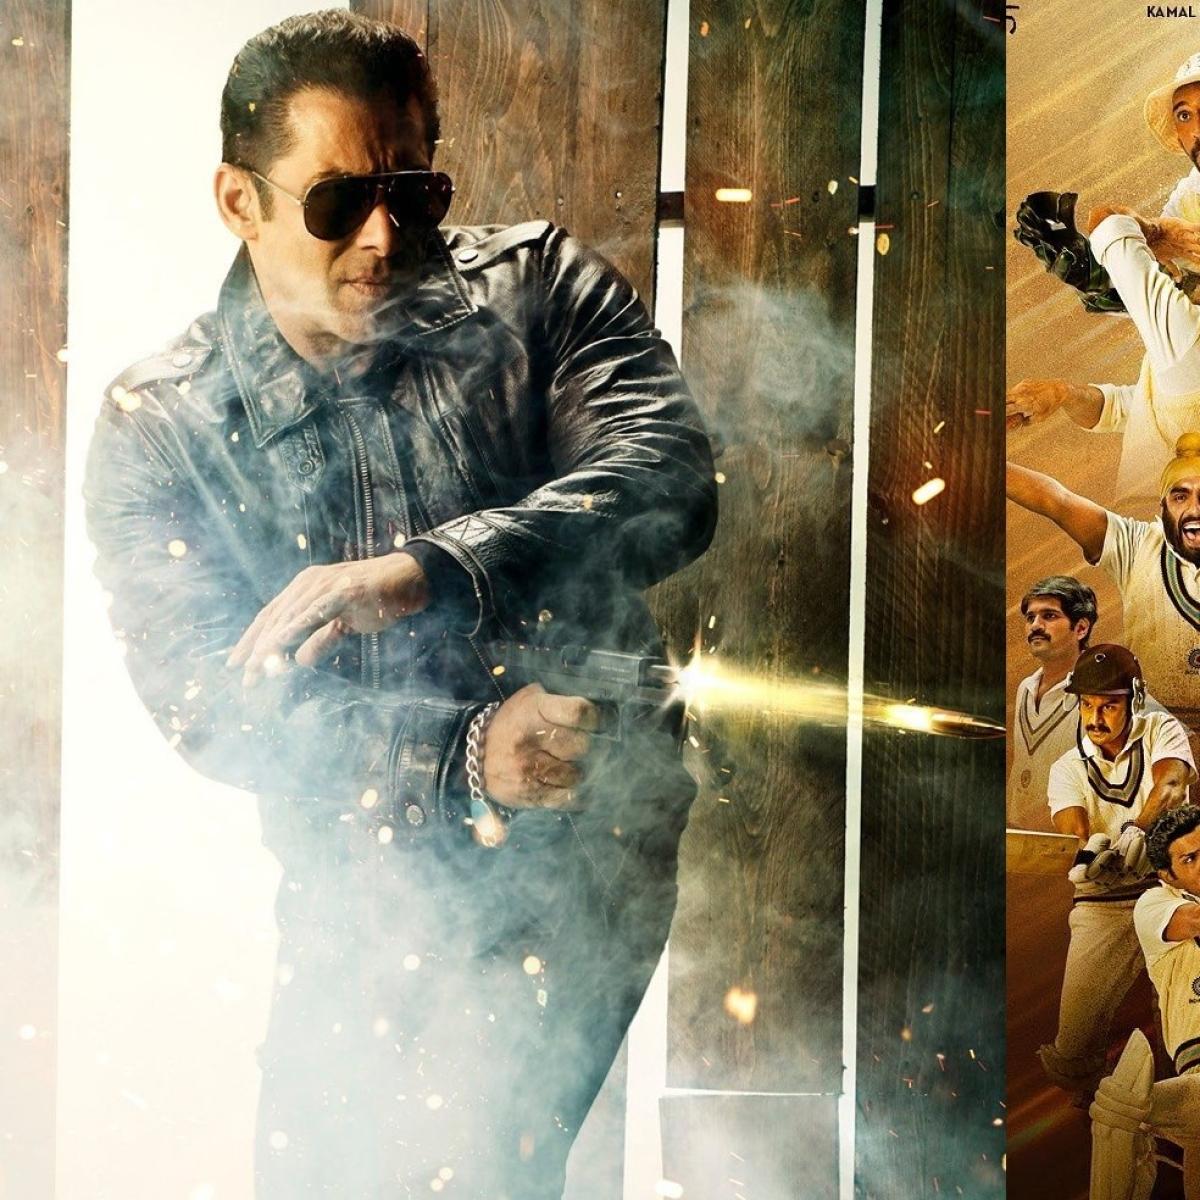 Avoiding clash with Salman Khan's 'Radhe', Ranveer Singh's '83' to release in June 2021